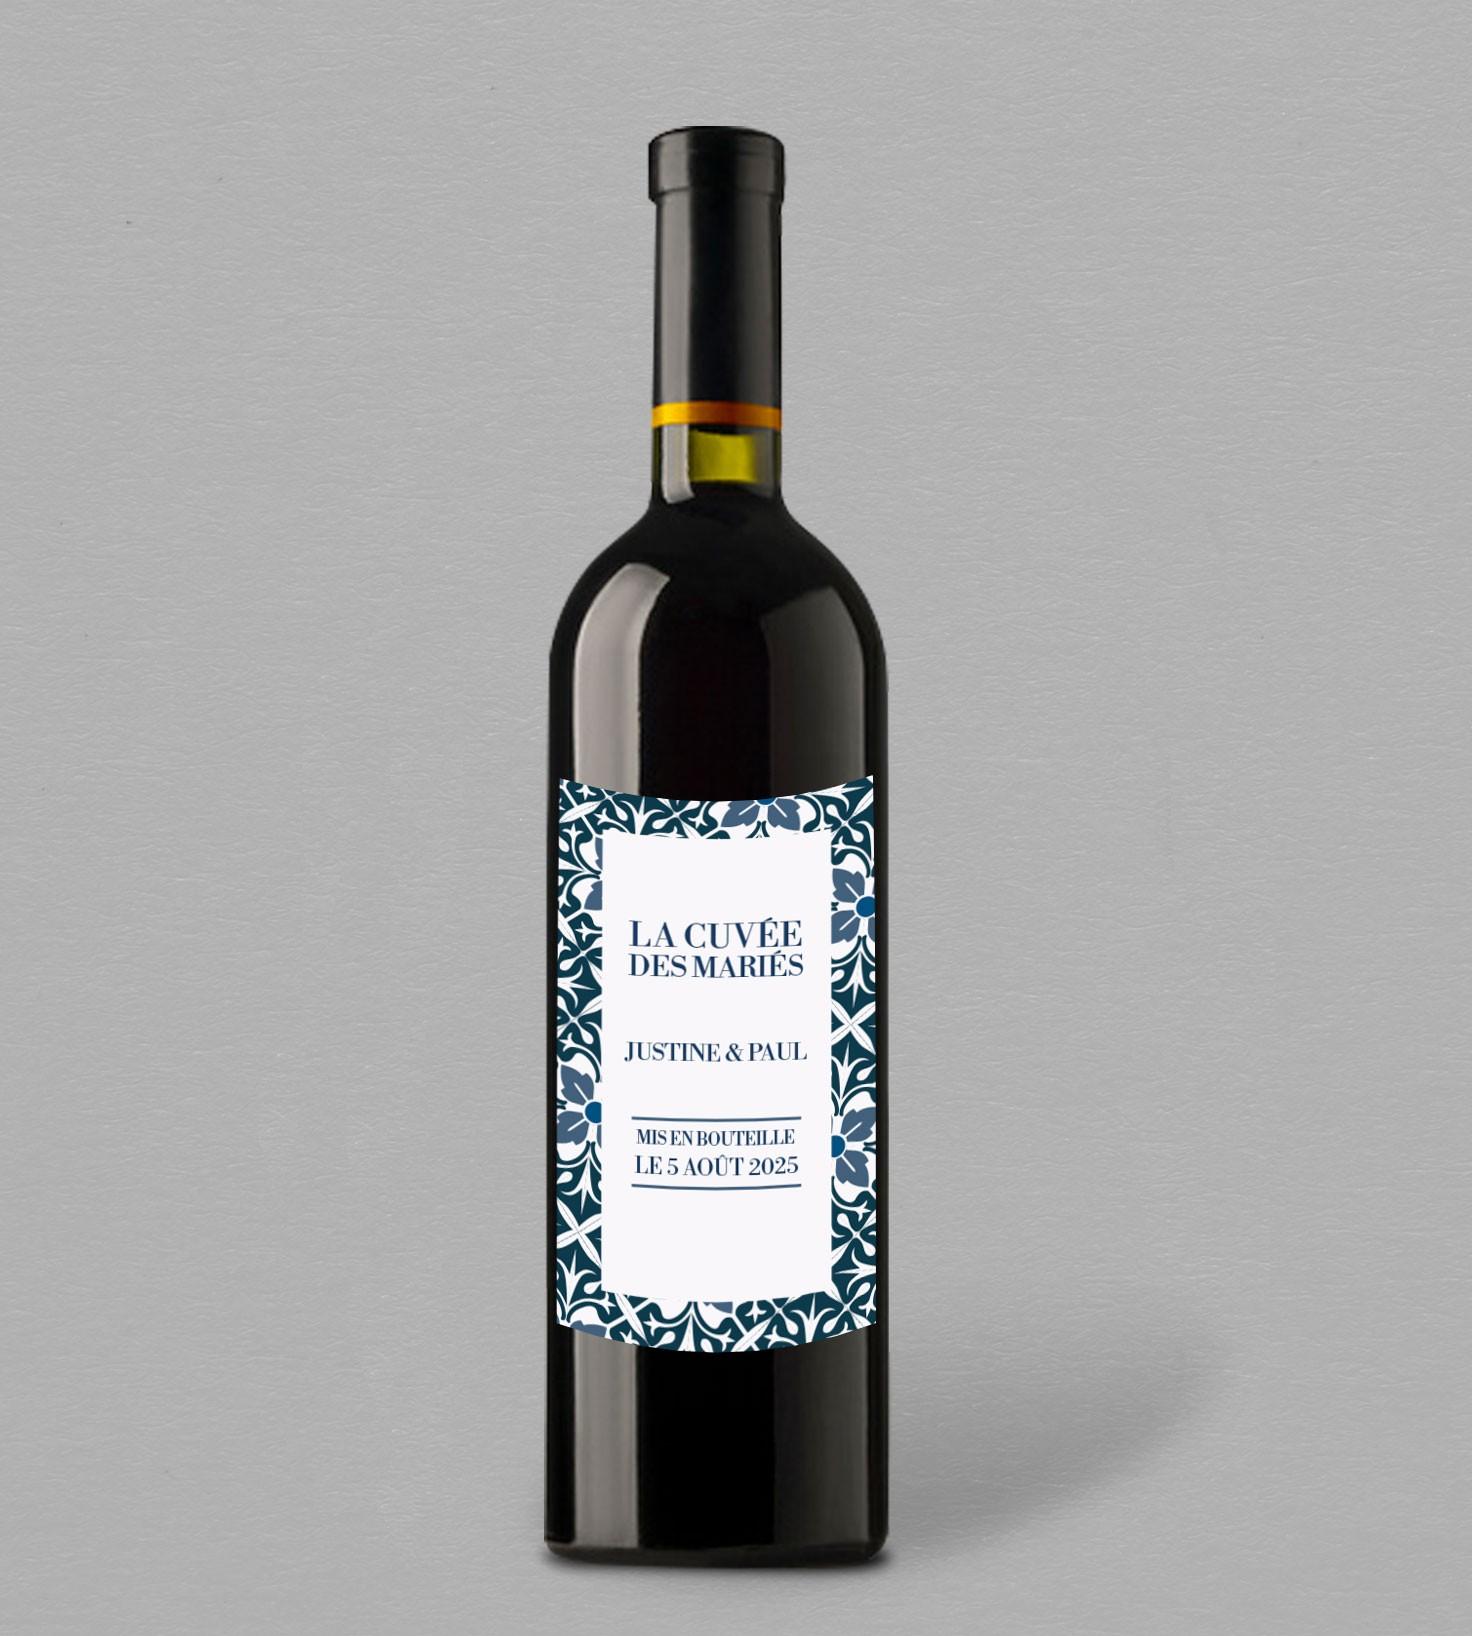 etiquette bouteille de vin personnaliser en ligne collection jeanne. Black Bedroom Furniture Sets. Home Design Ideas